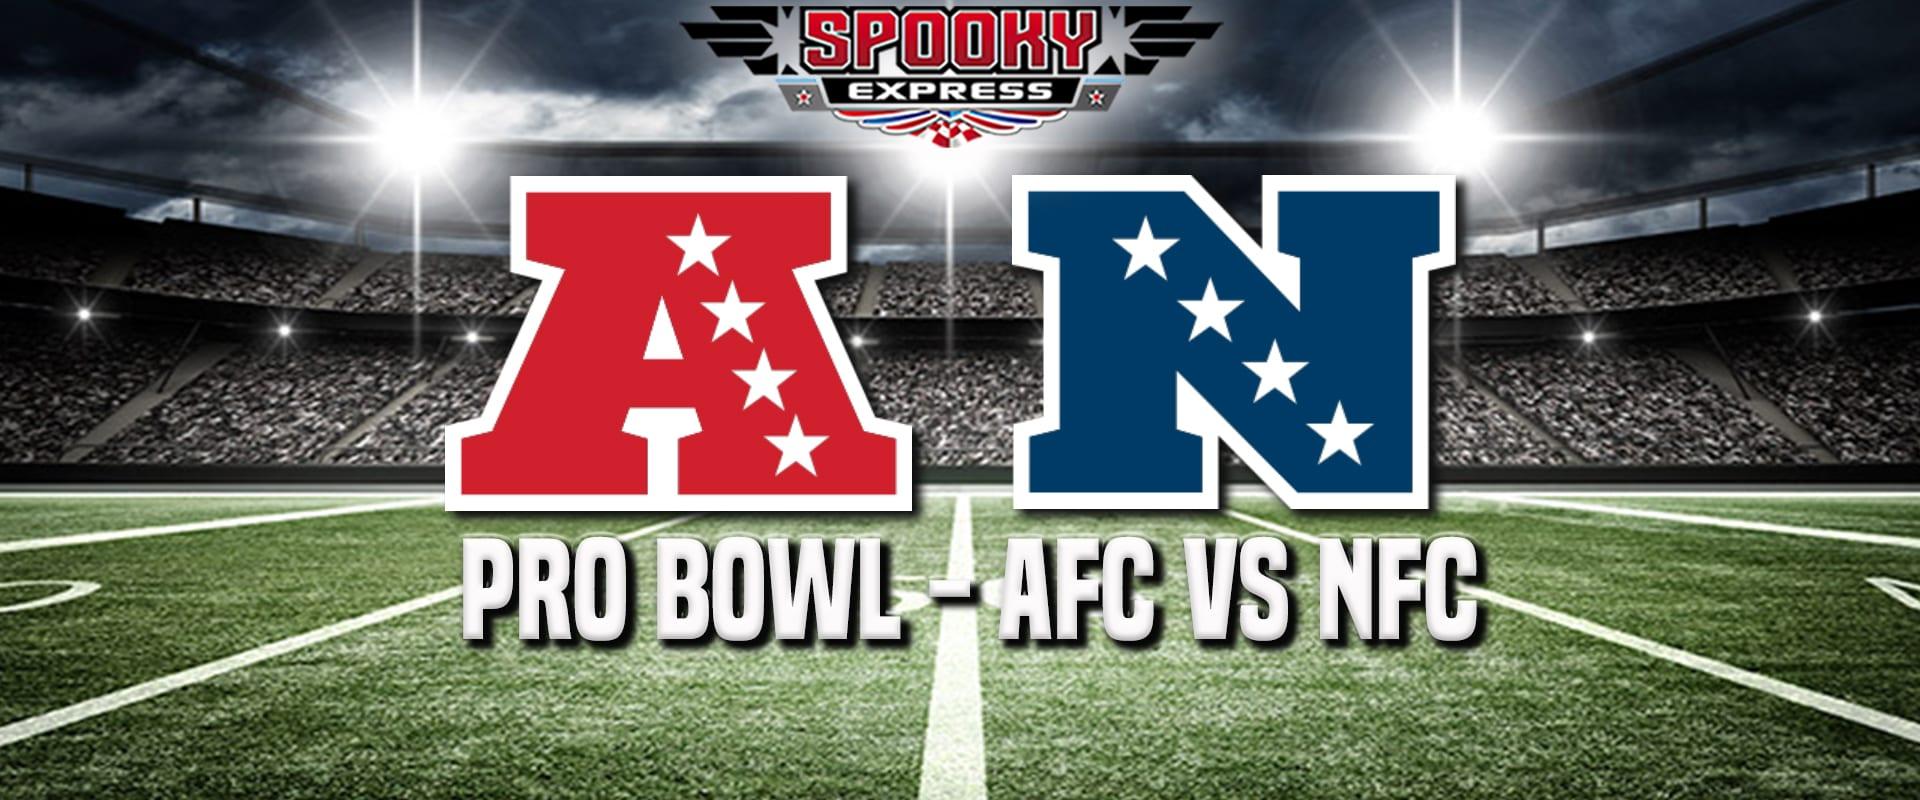 e1e5a9359 NFL Pro Bowl Betting Preview: AFC vs. NFC